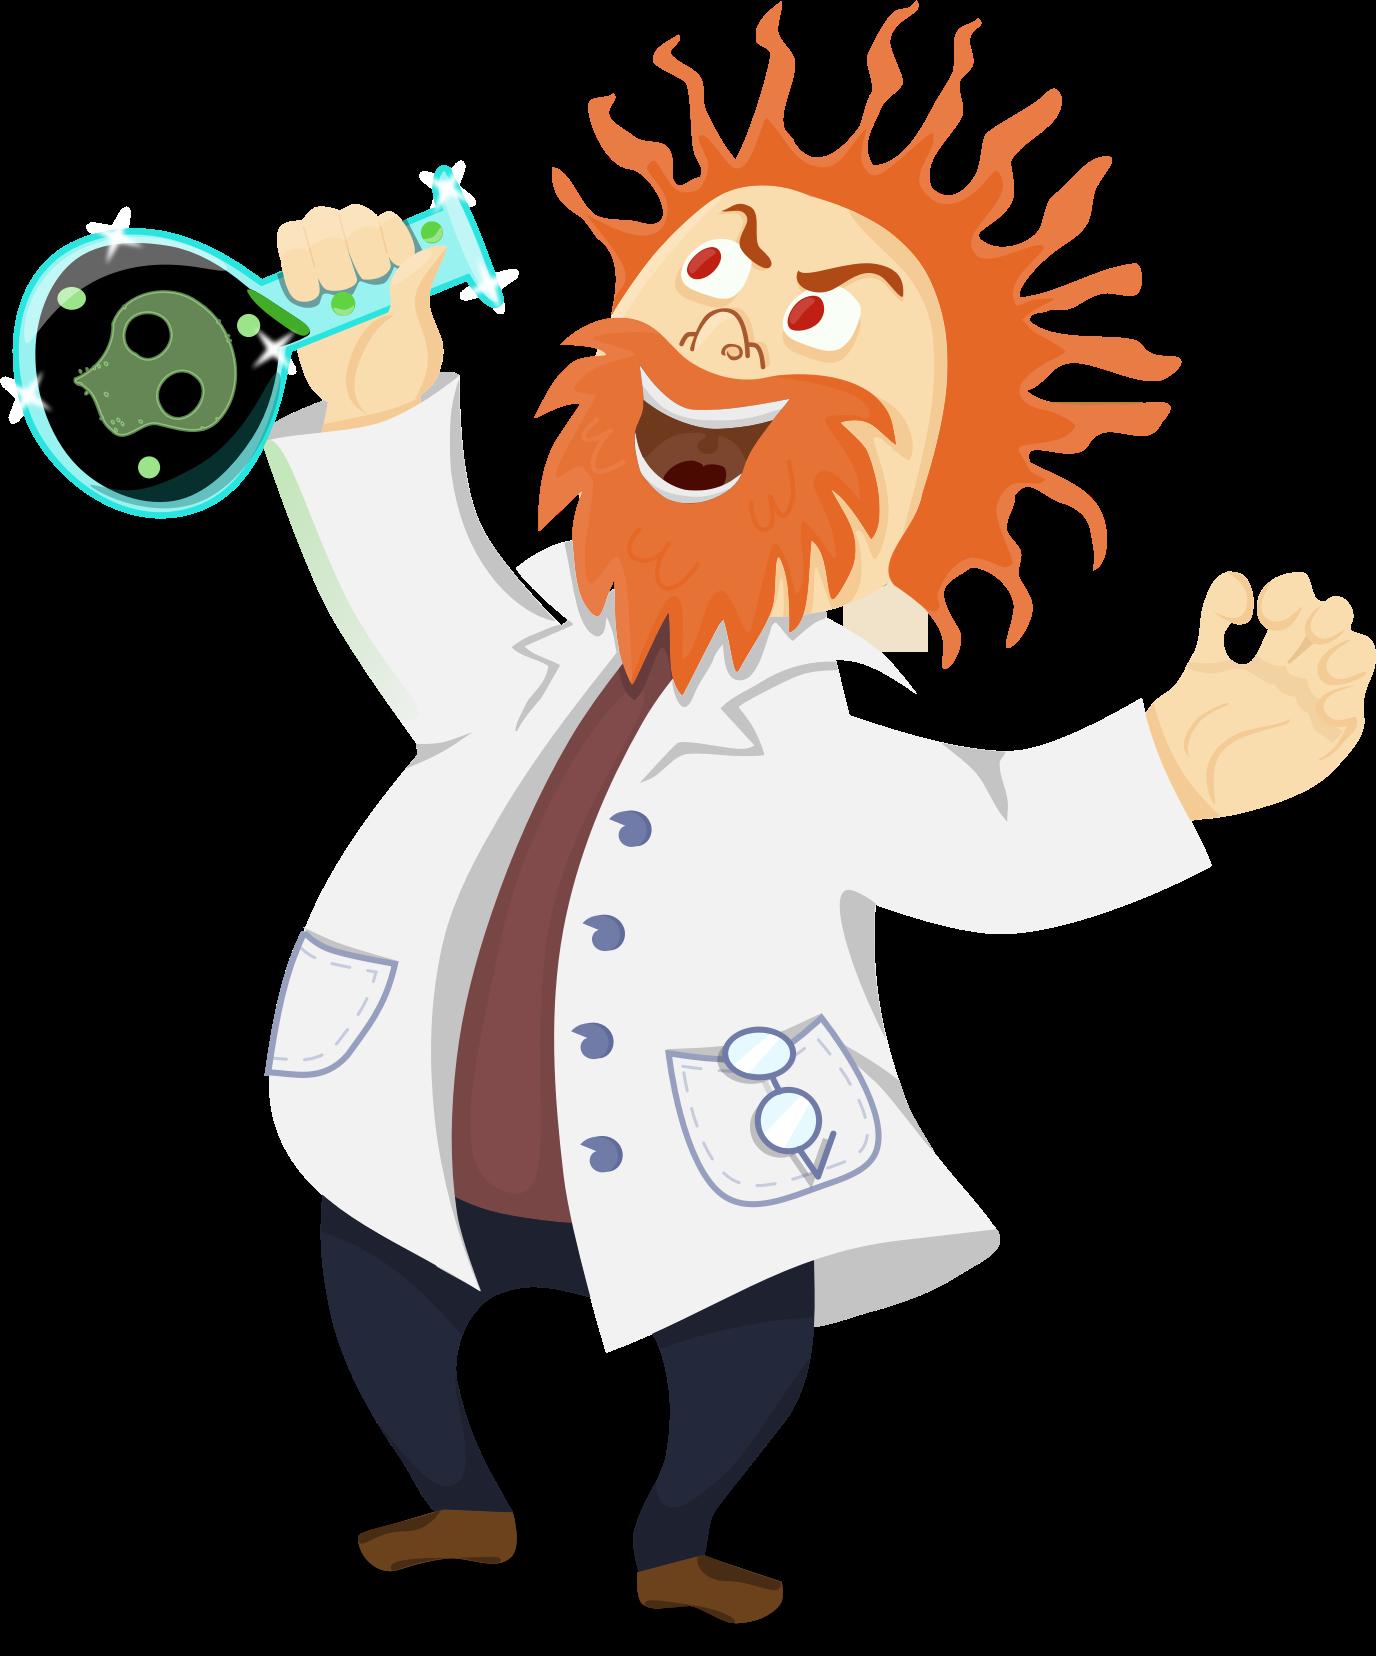 Money scientist clipart jpg freeuse Scientist PNG Transparent Images | PNG All jpg freeuse